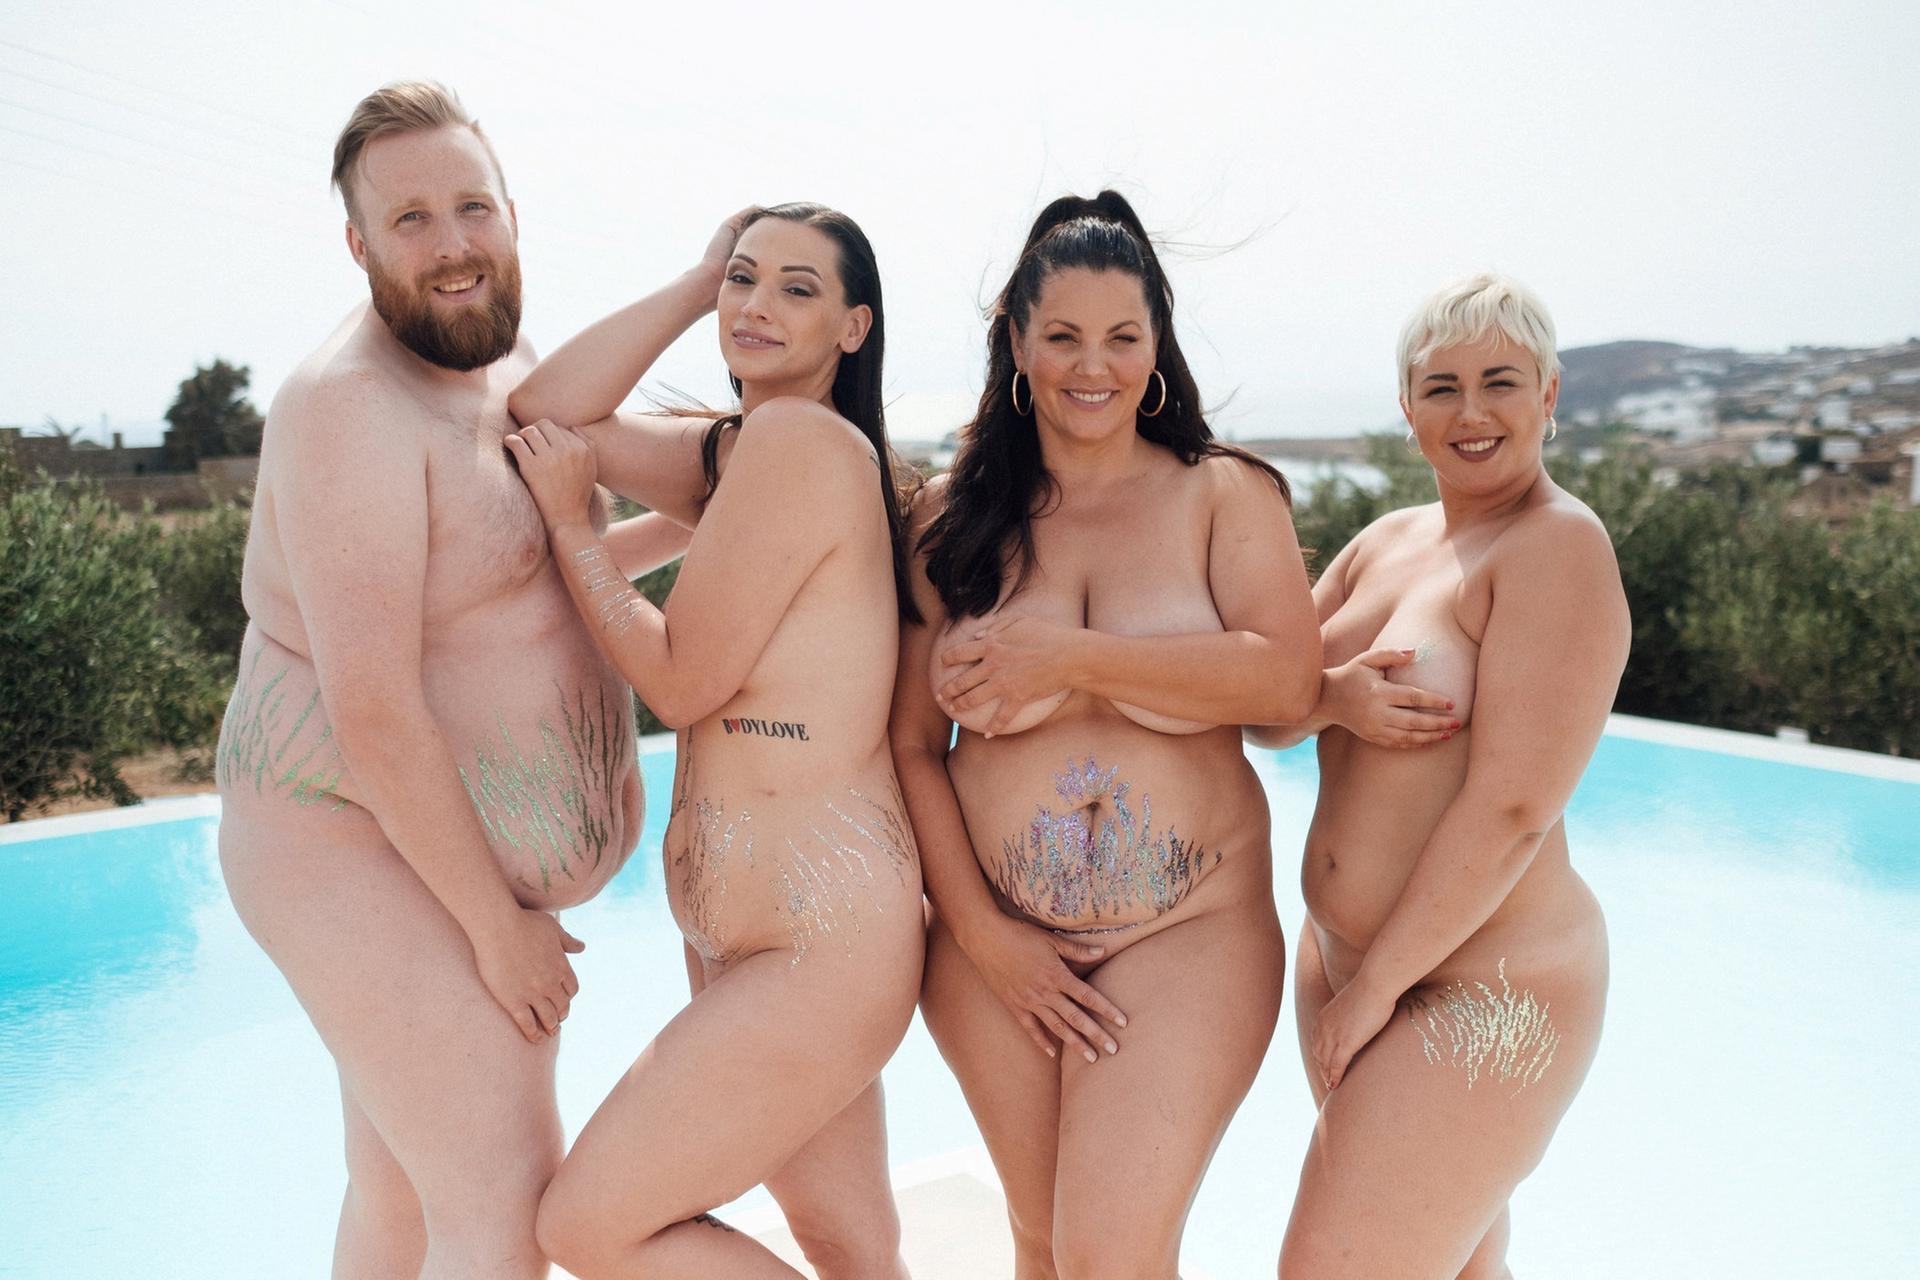 Nackt tutti frutti kandidatin 30 Jahre